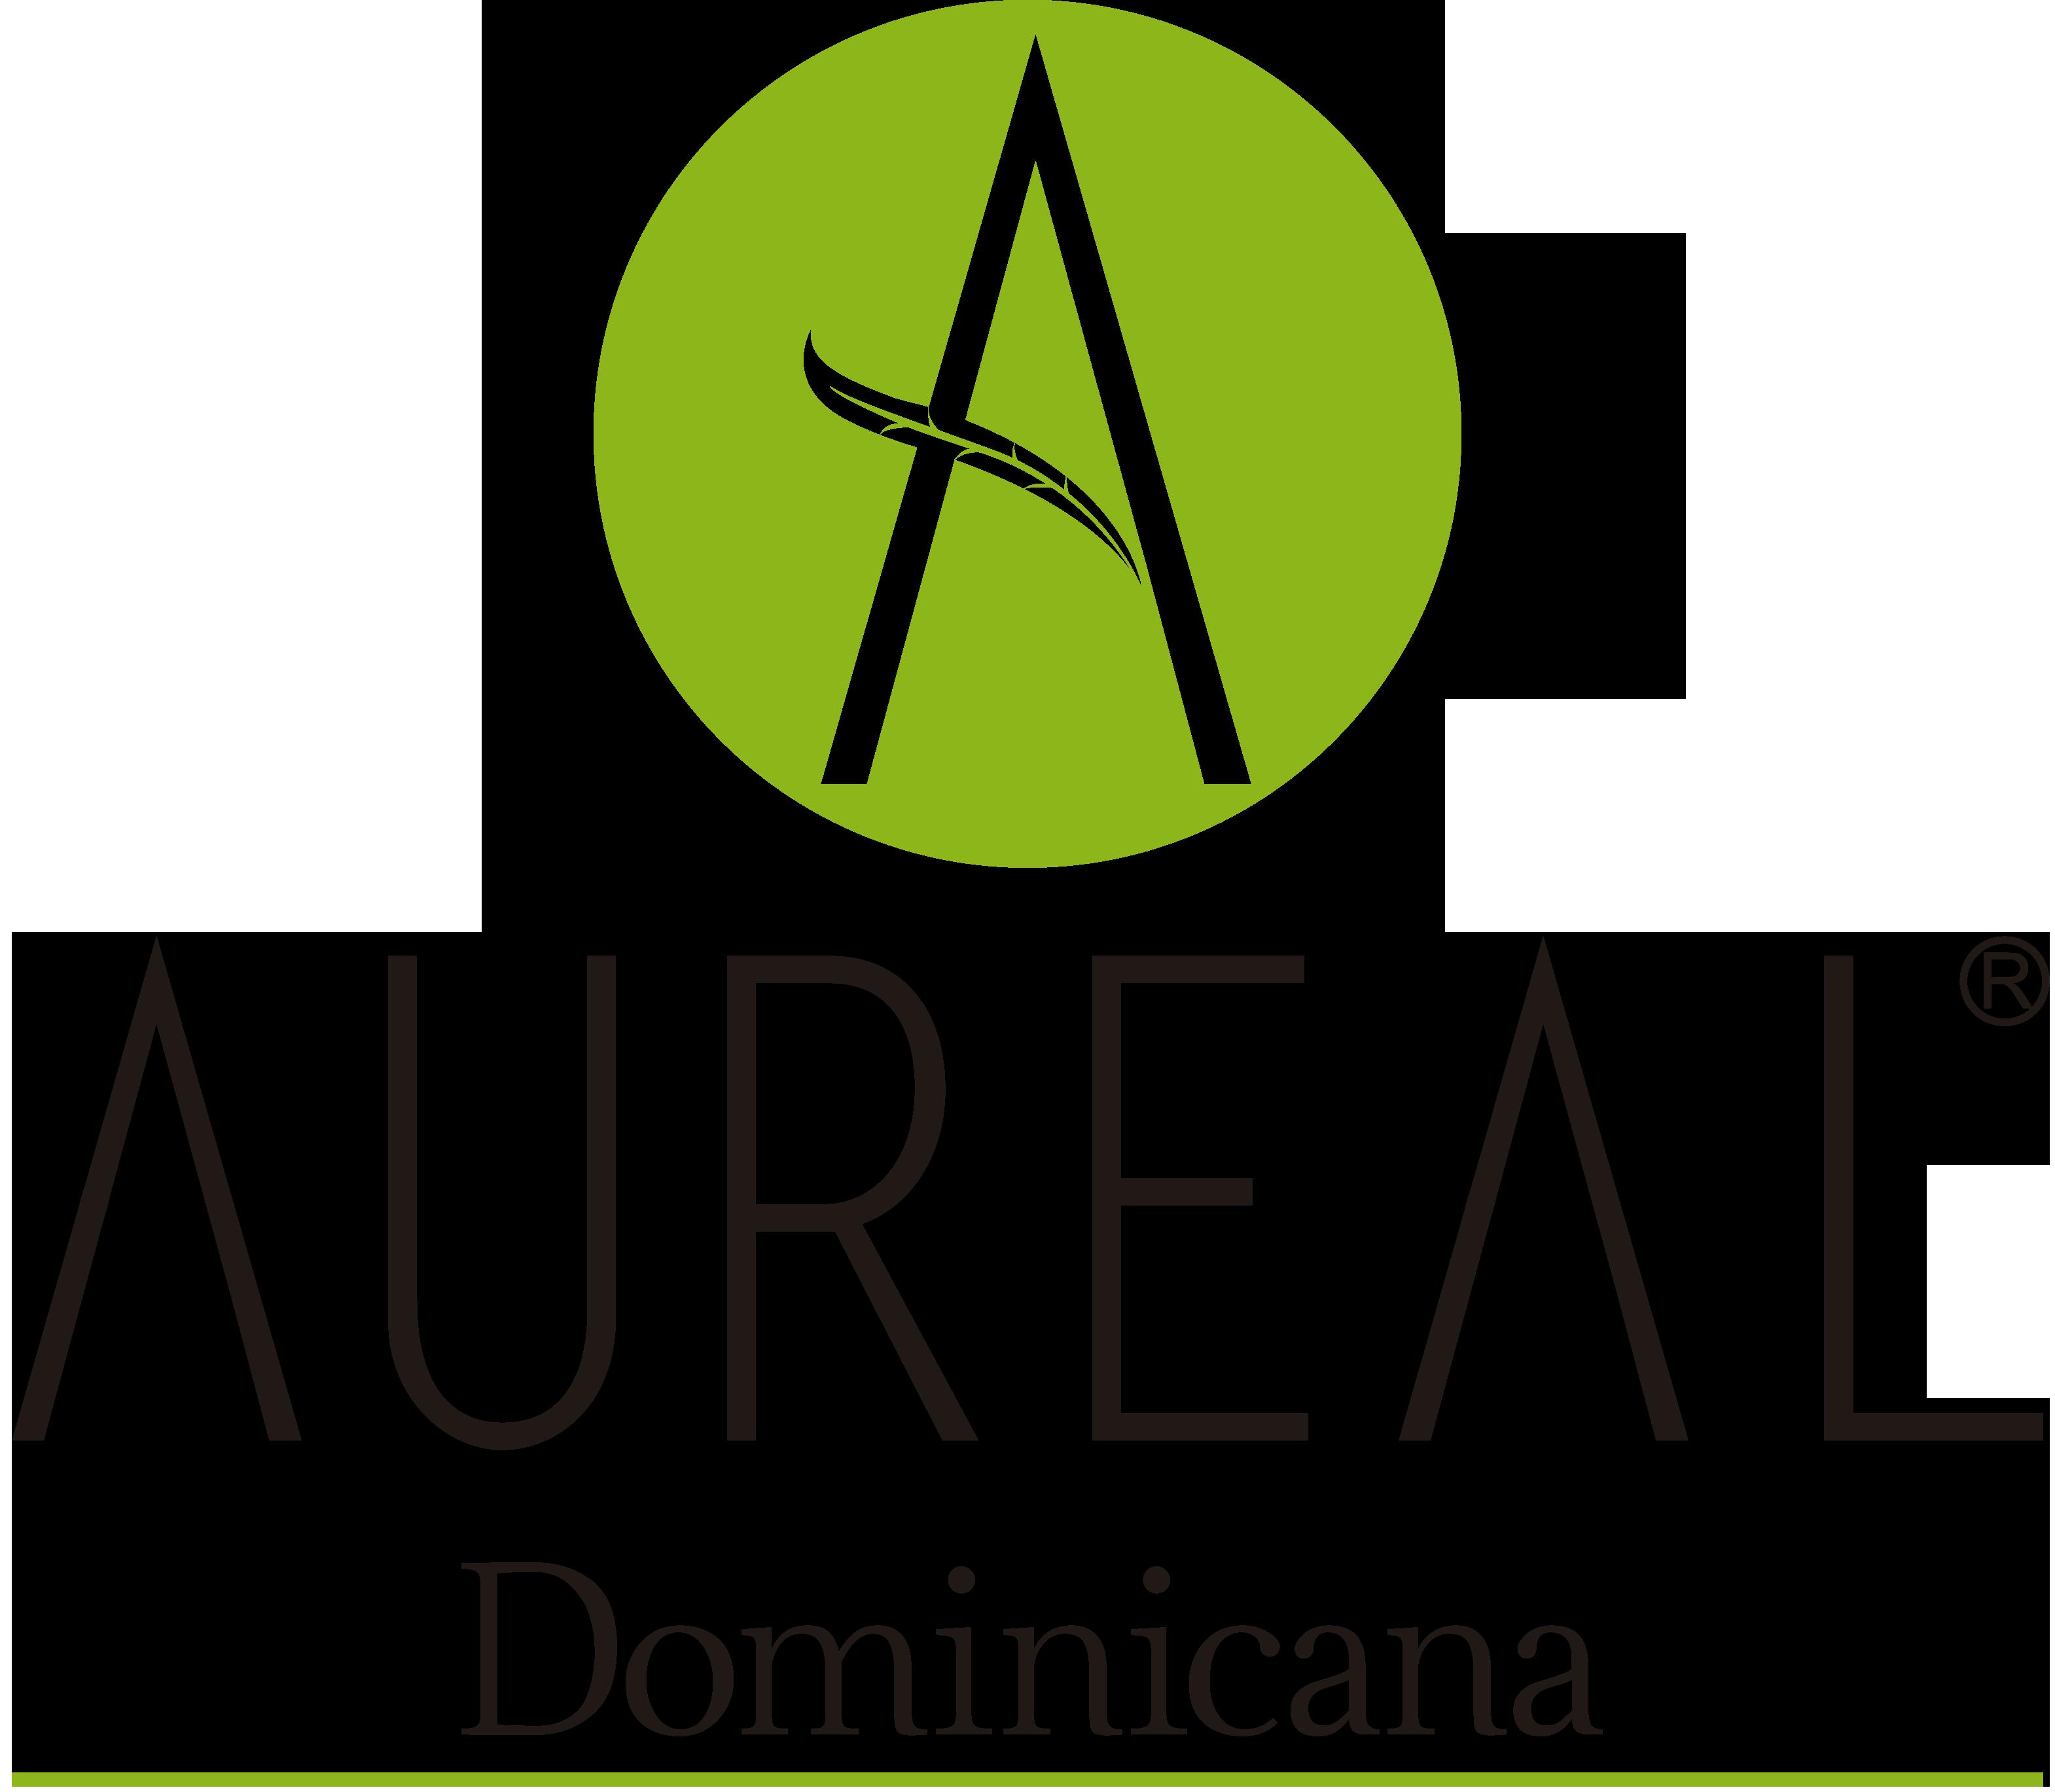 logotipo7